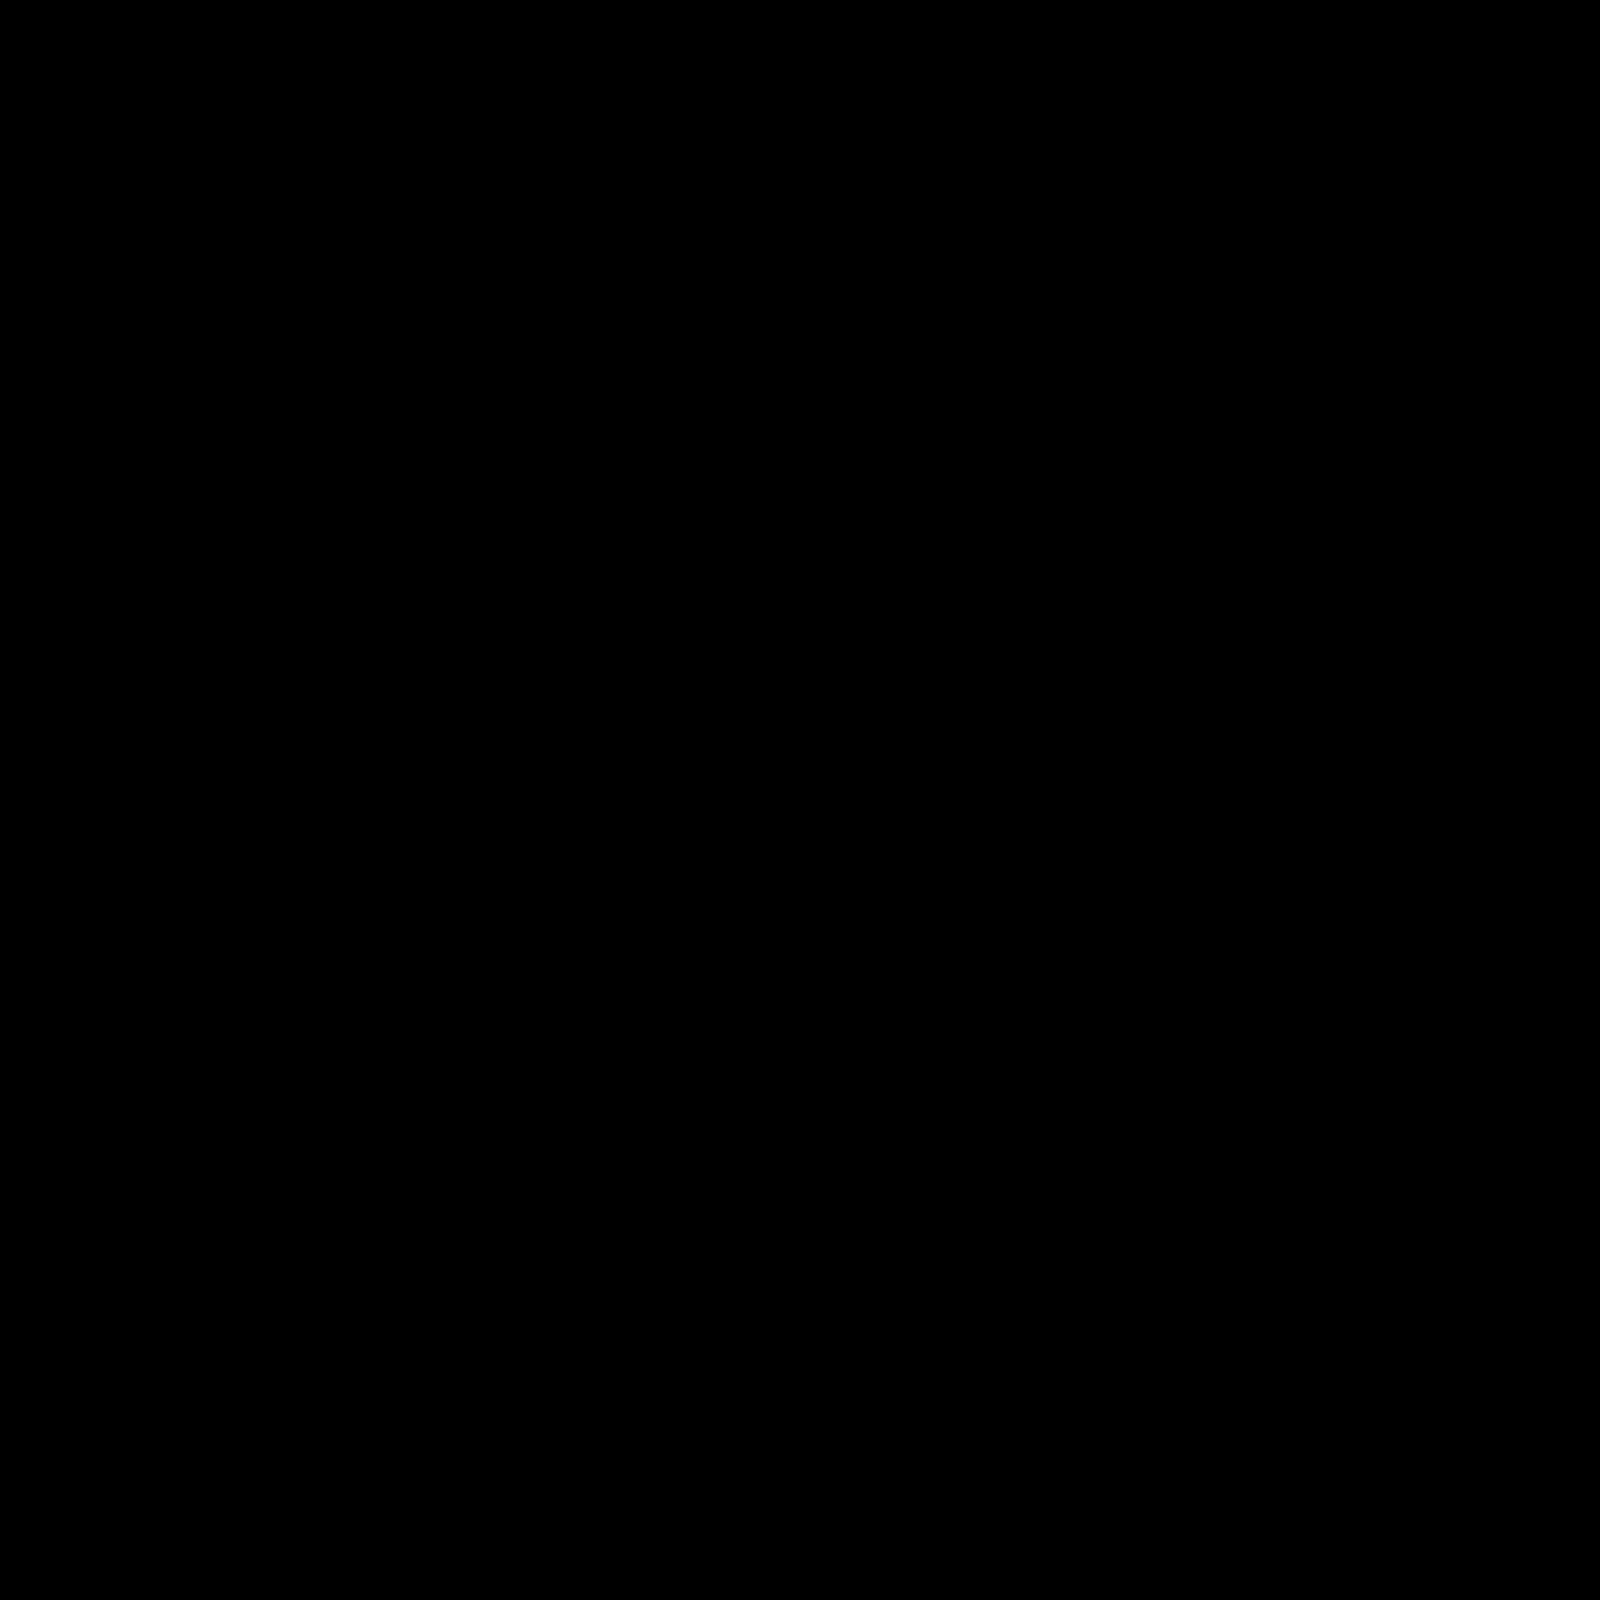 Hand Poking Tool icon